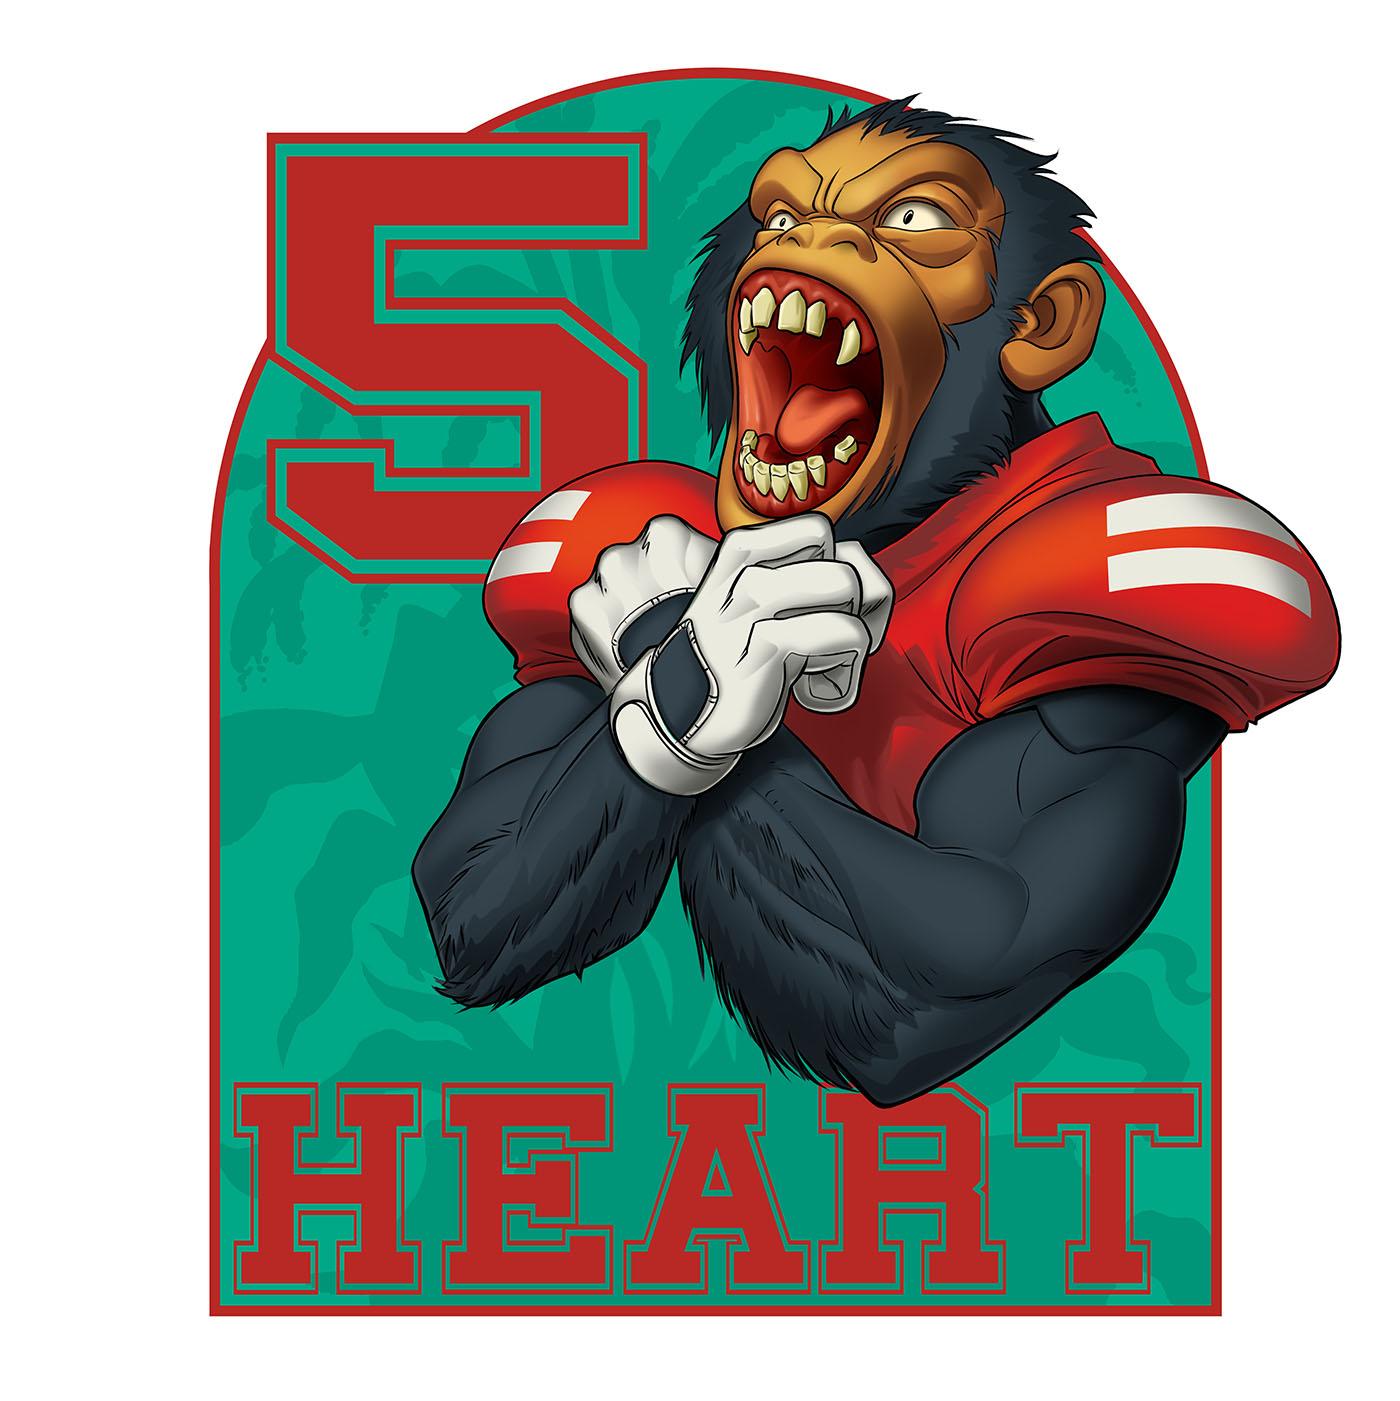 Jittery Monkey Podcasting Network » Five Heart Podcast